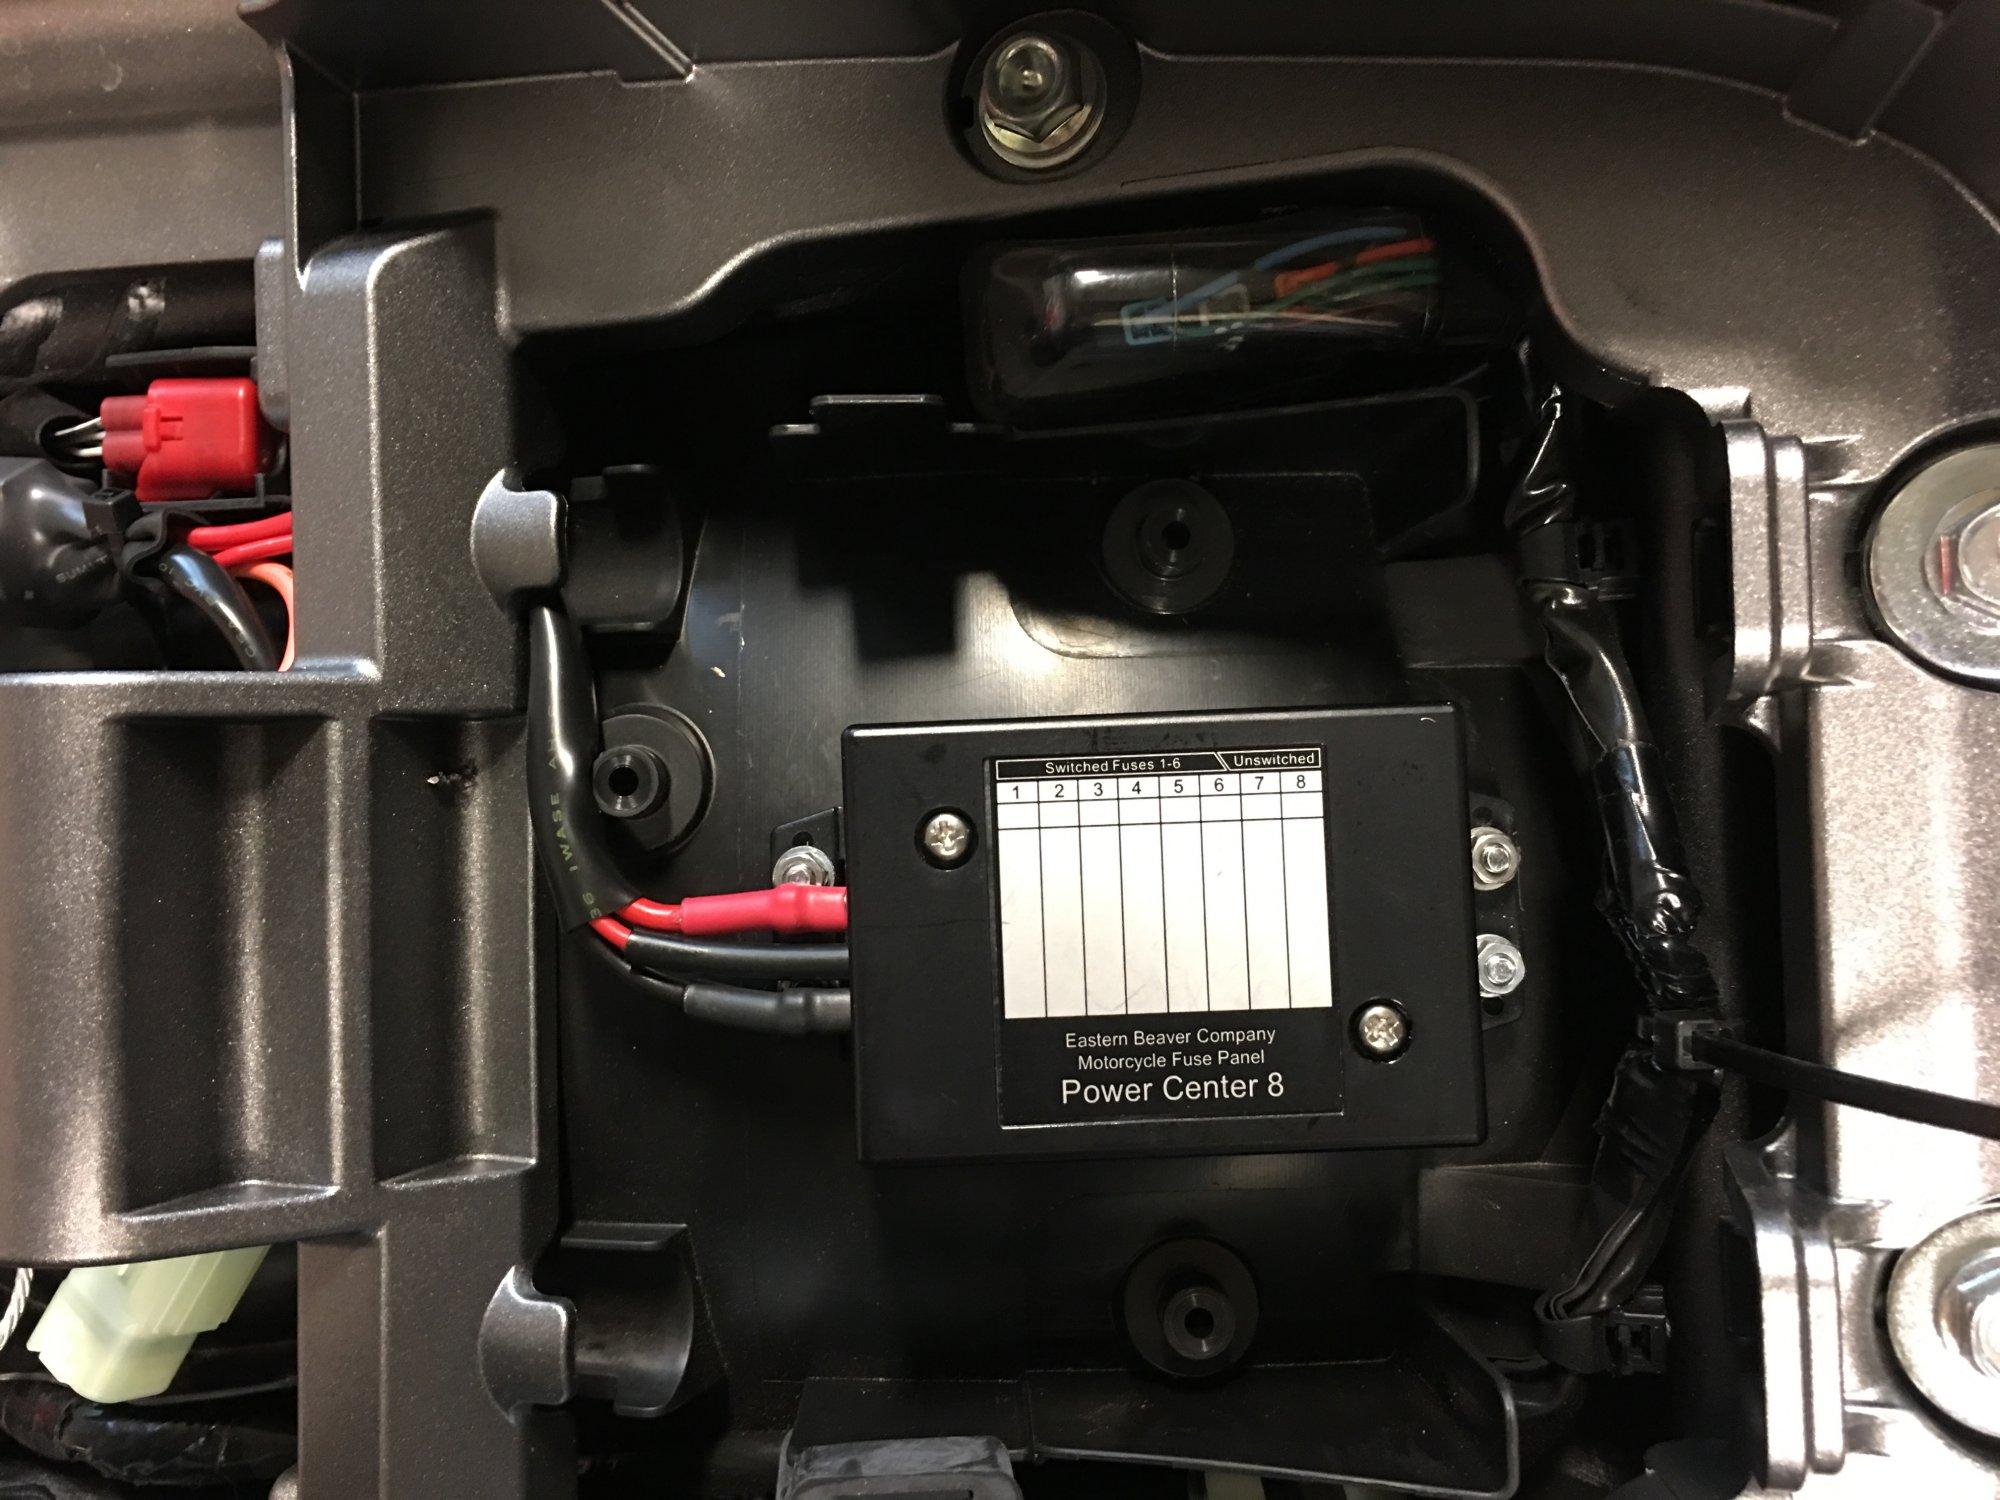 PC8 fuzebox w cover.JPG